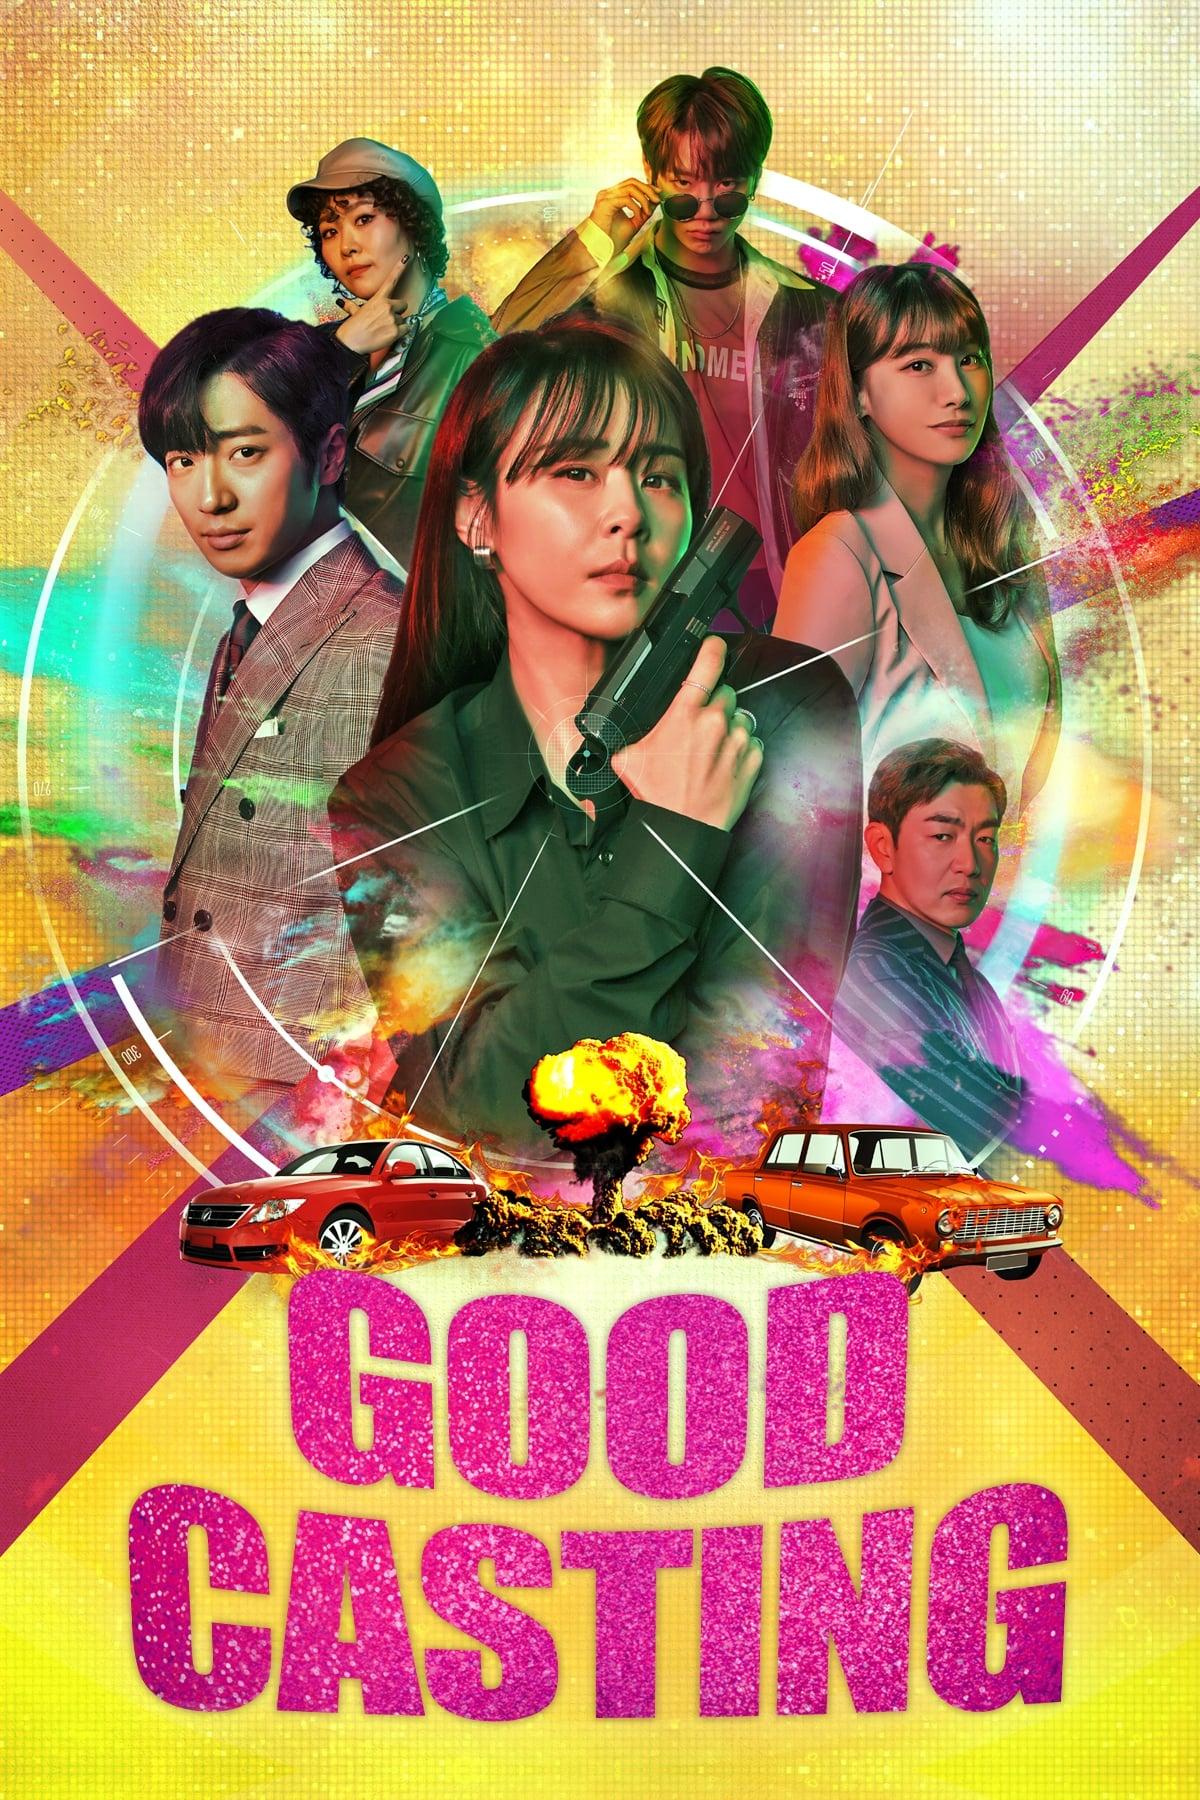 Xem Phim Giả Danh - Good Casting Full Vietsub   Thuyết Minh HD Online